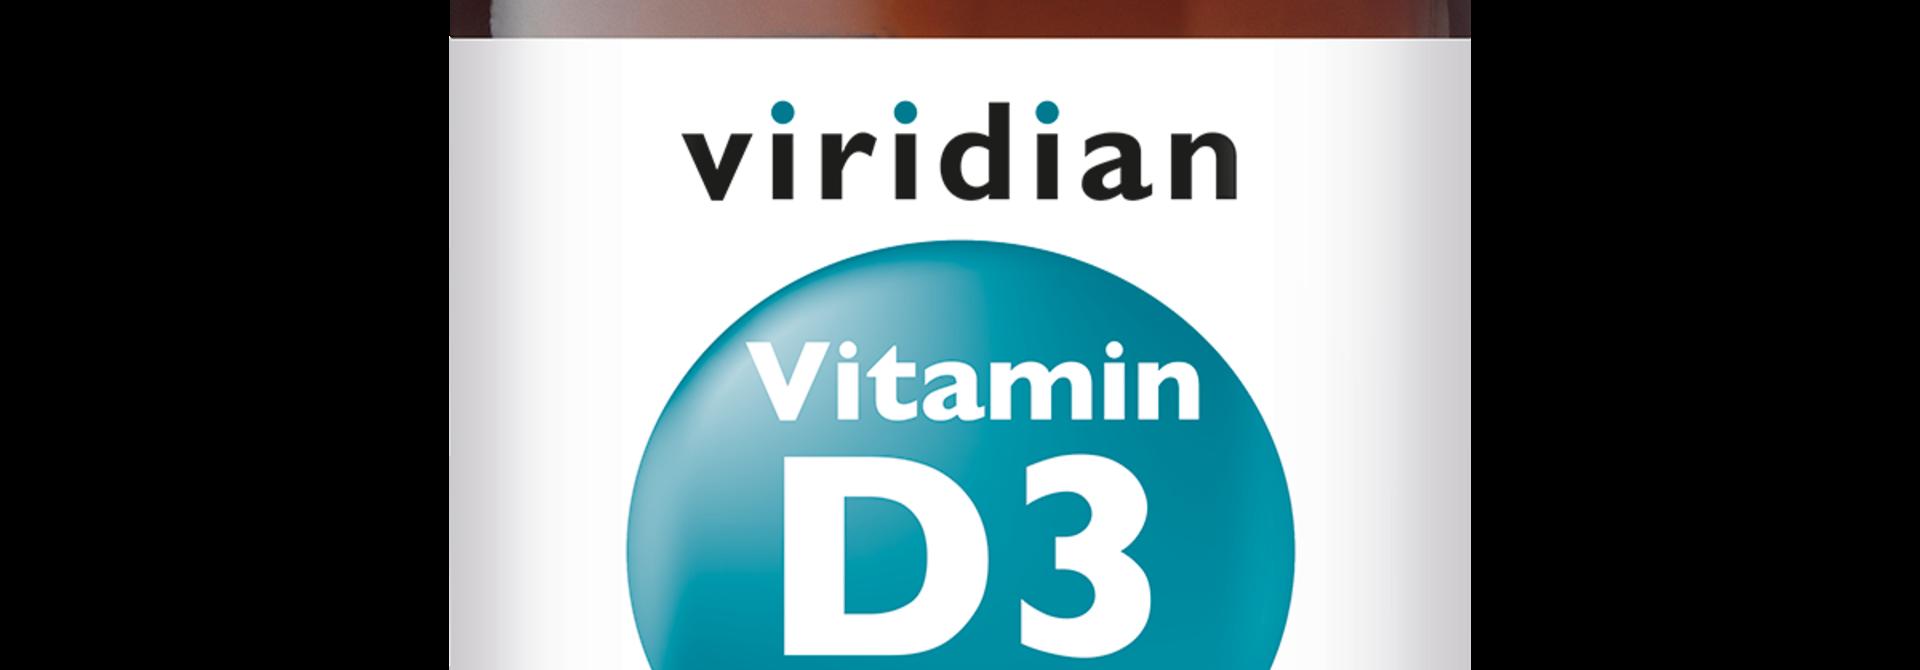 Vitamin D3 (Vegan) 400 IU (10 mcg) 90 plantaardige capsules